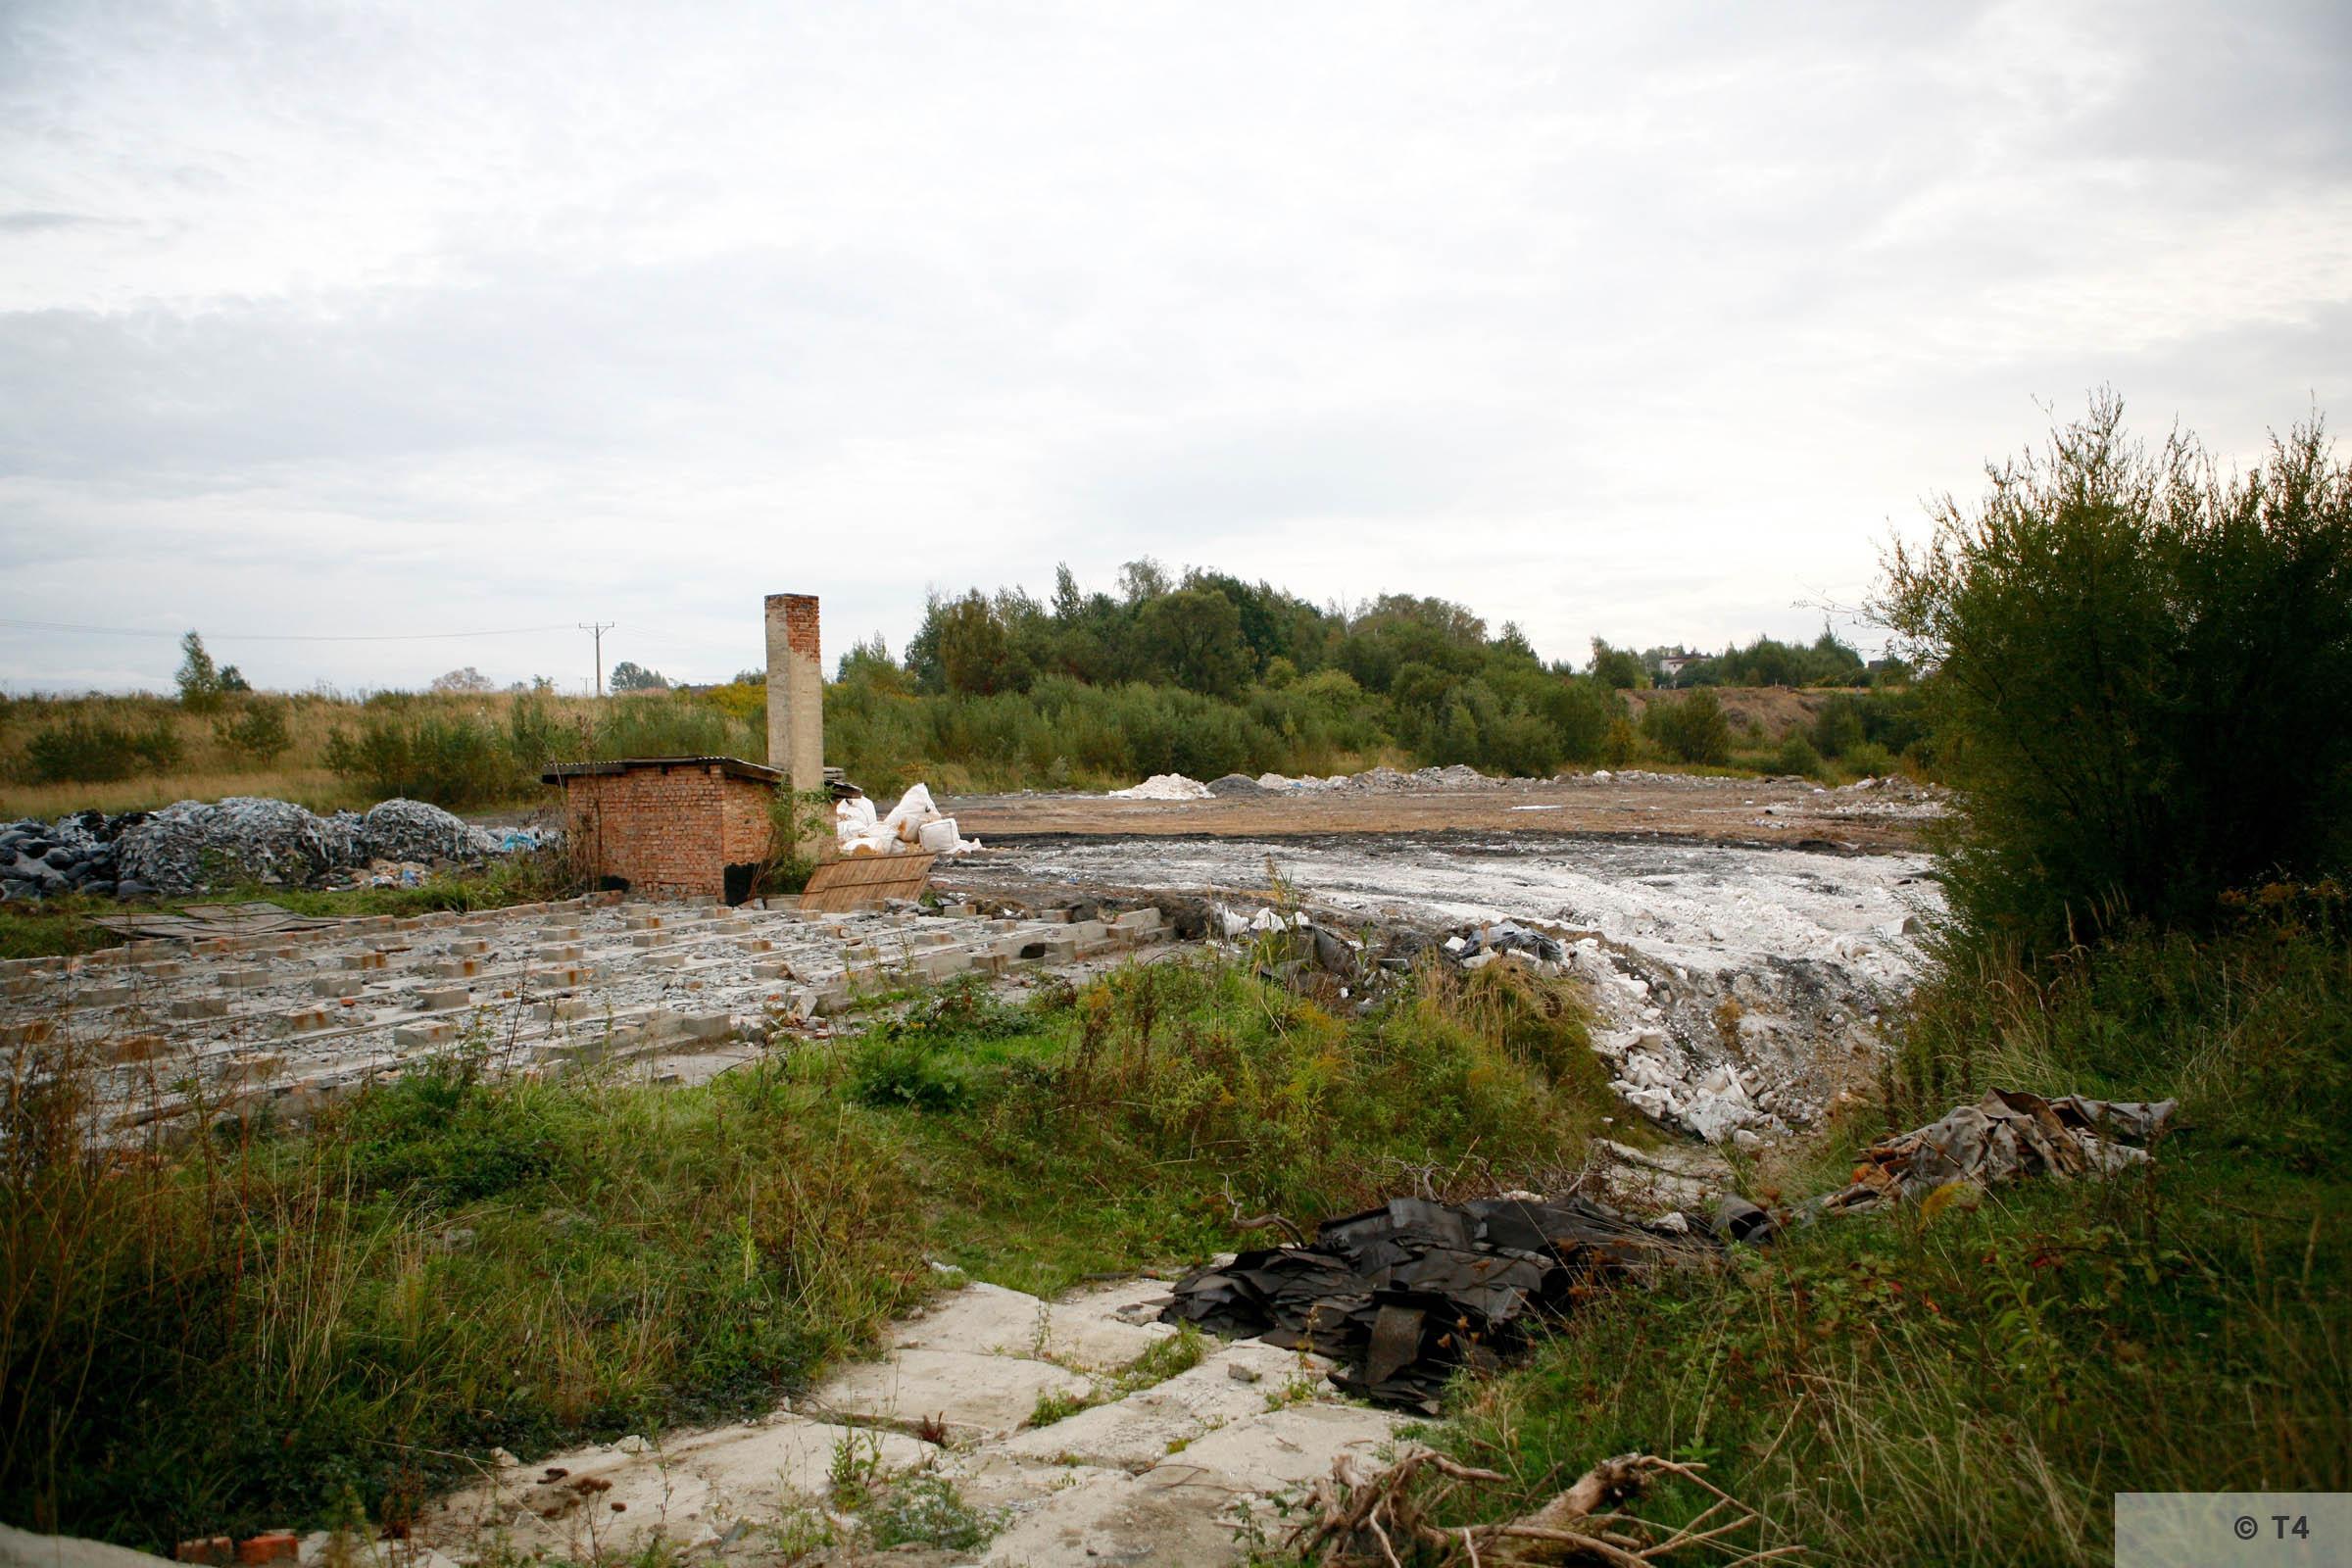 Former Hercer brickyard. 2006 T4 3621